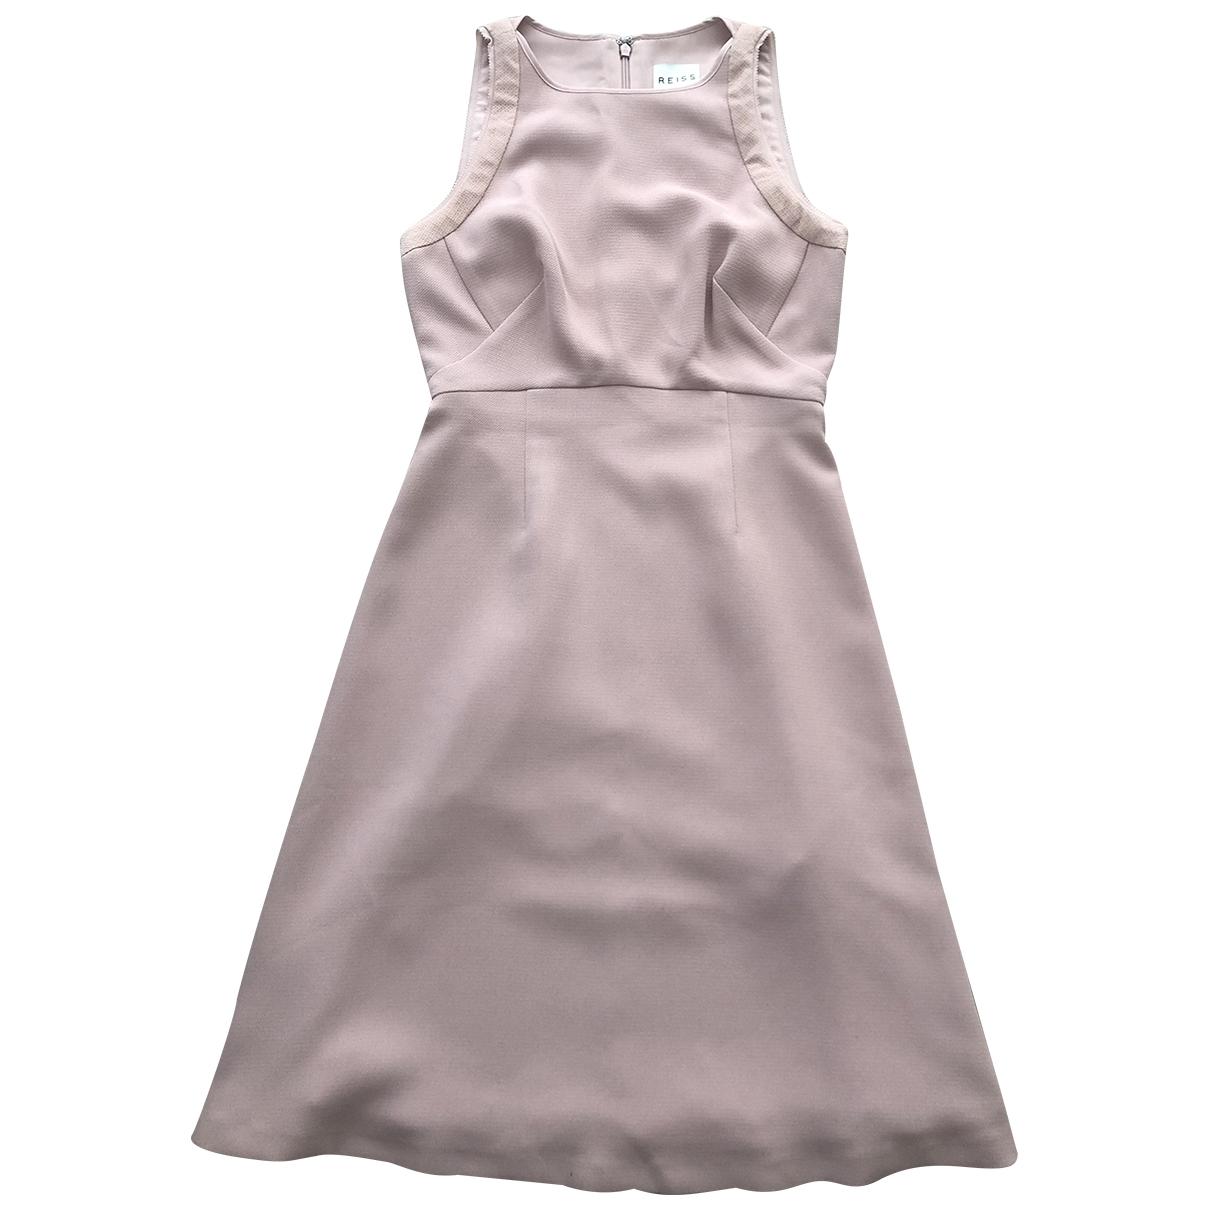 Reiss \N Pink dress for Women 34 FR